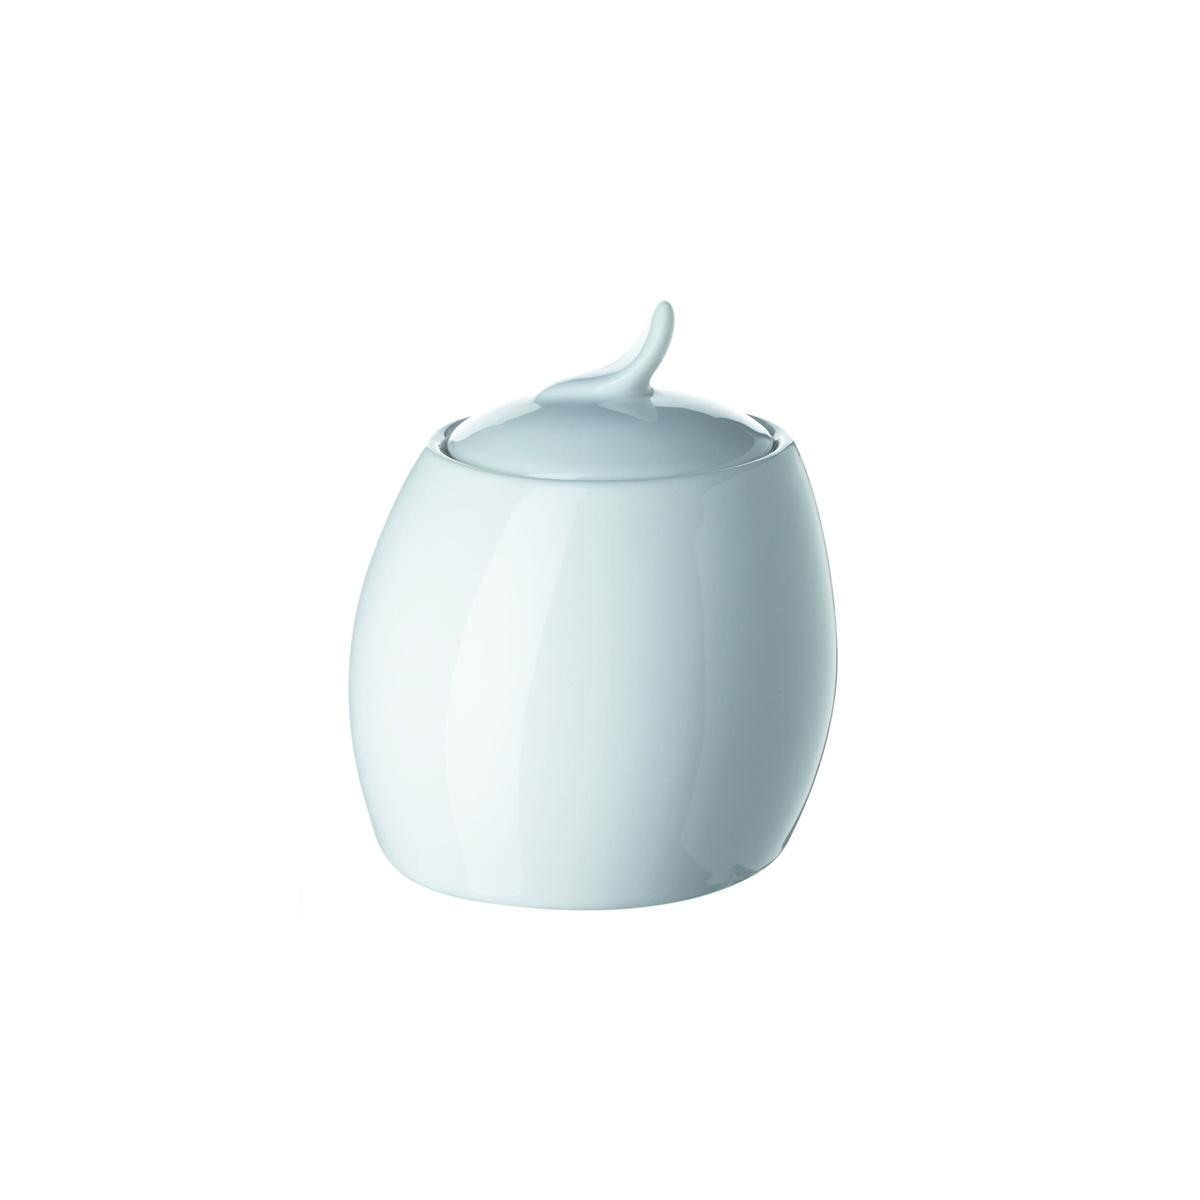 Mäser Porcelánová cukornička La Musica, 250 ml